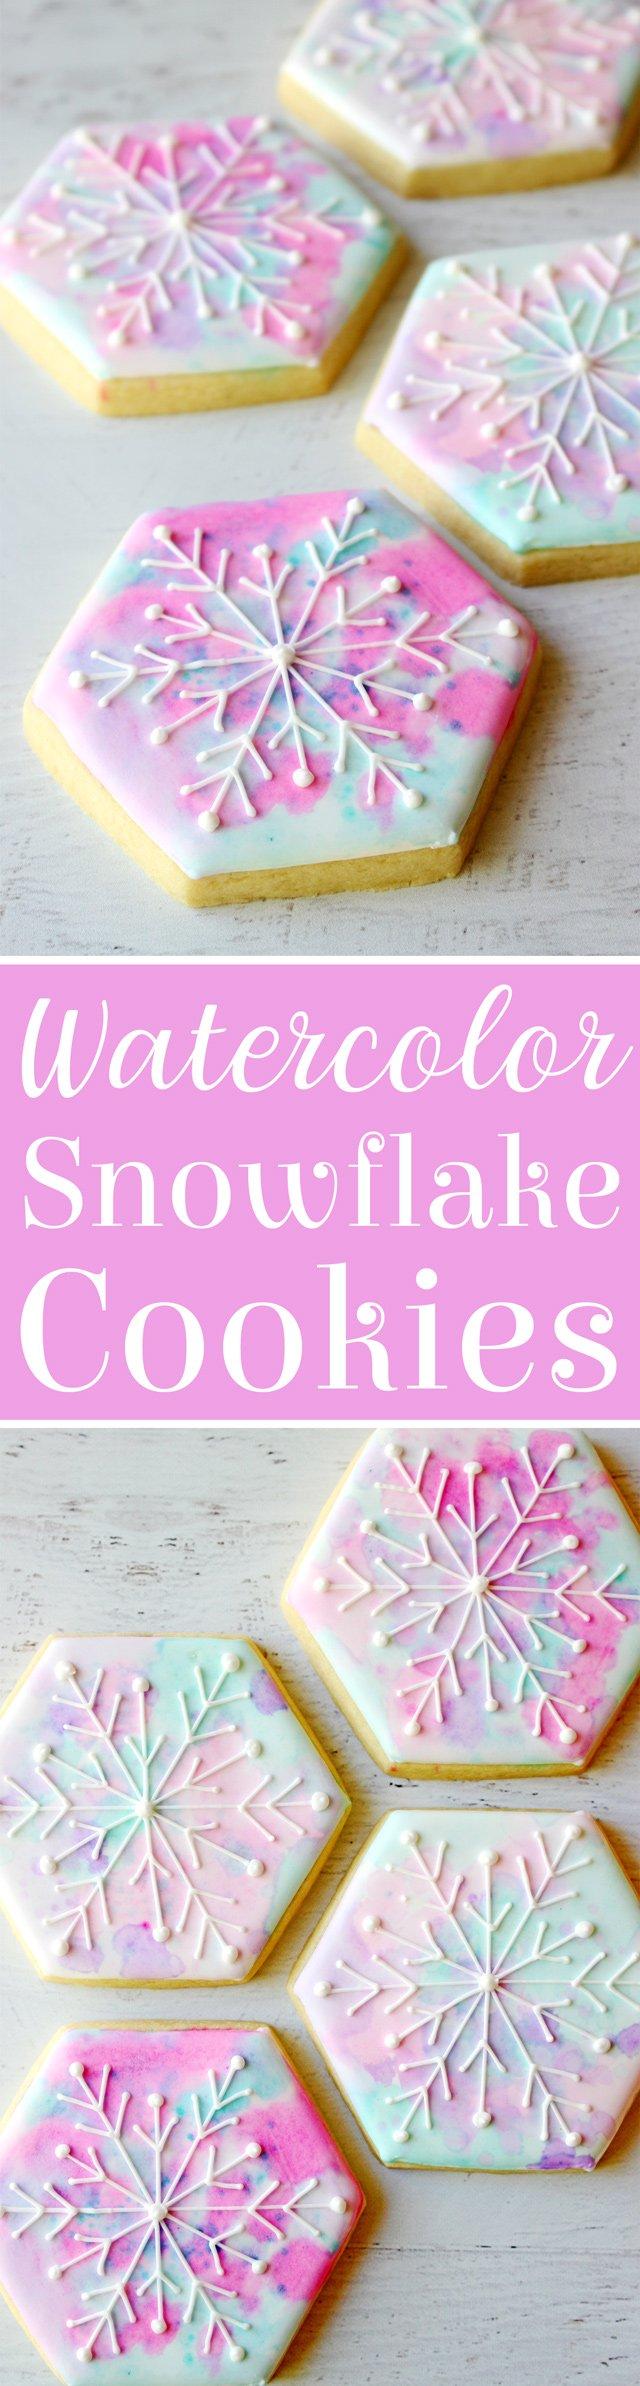 Hexagon Snowflake Cookies